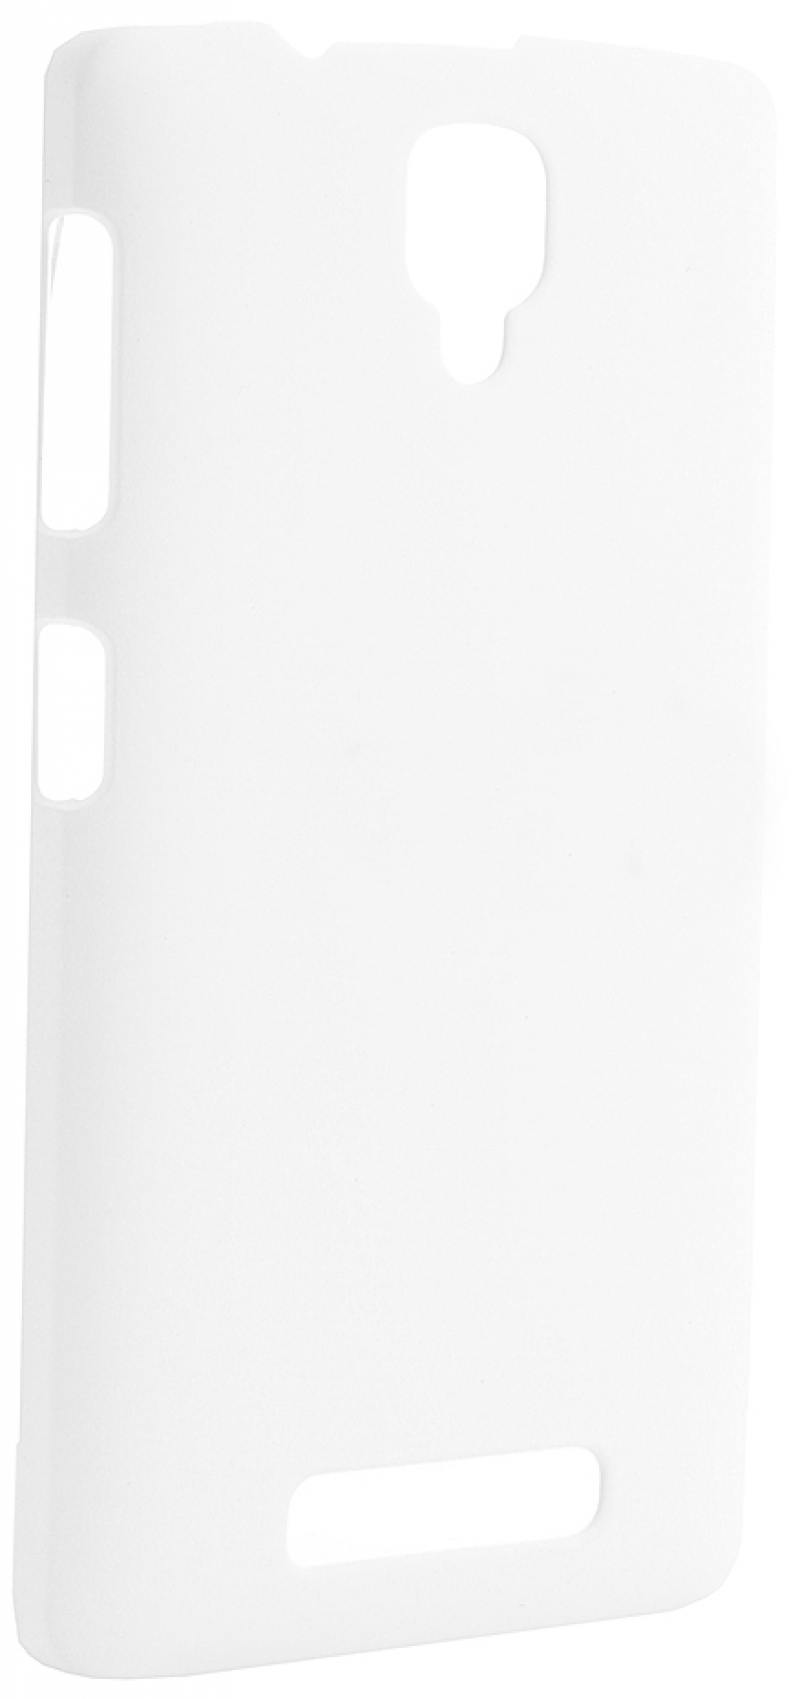 Чехол-накладка Pulsar CLIPCASE PC Soft-Touch для Lenovo A1000 (белая) чехол для lg k7 x210 gecko силиконовая накладка прозрачно глянцевая белая